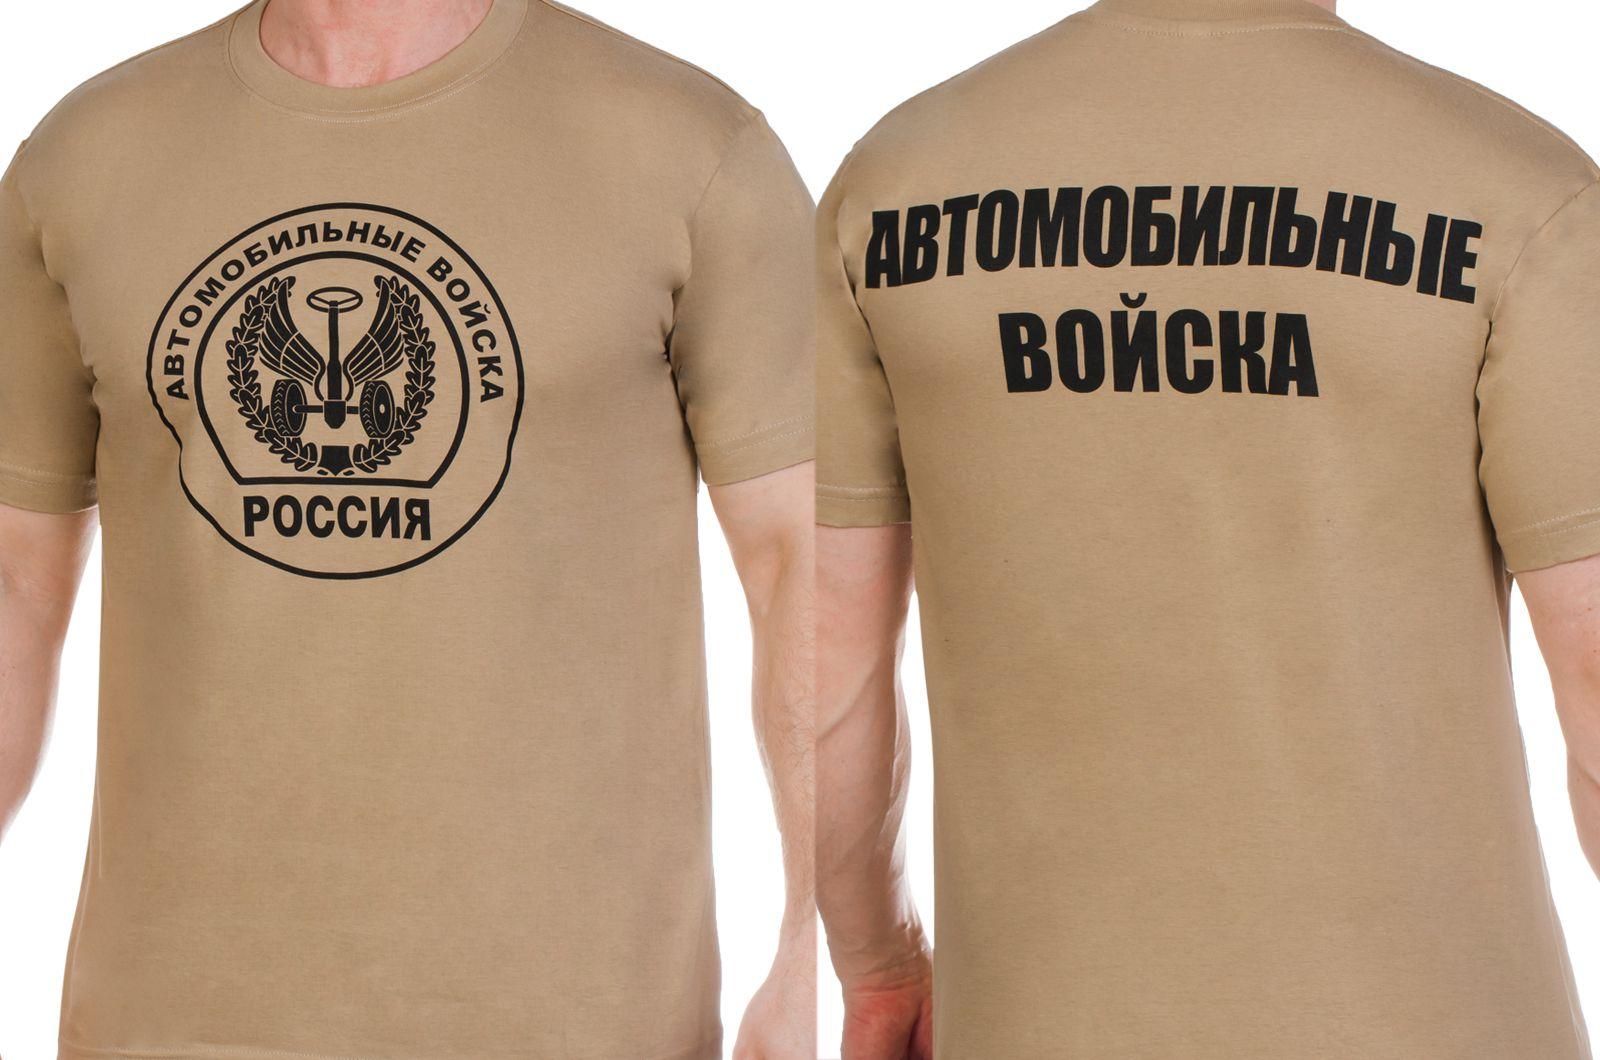 Заказать футболки с символикой Автобата